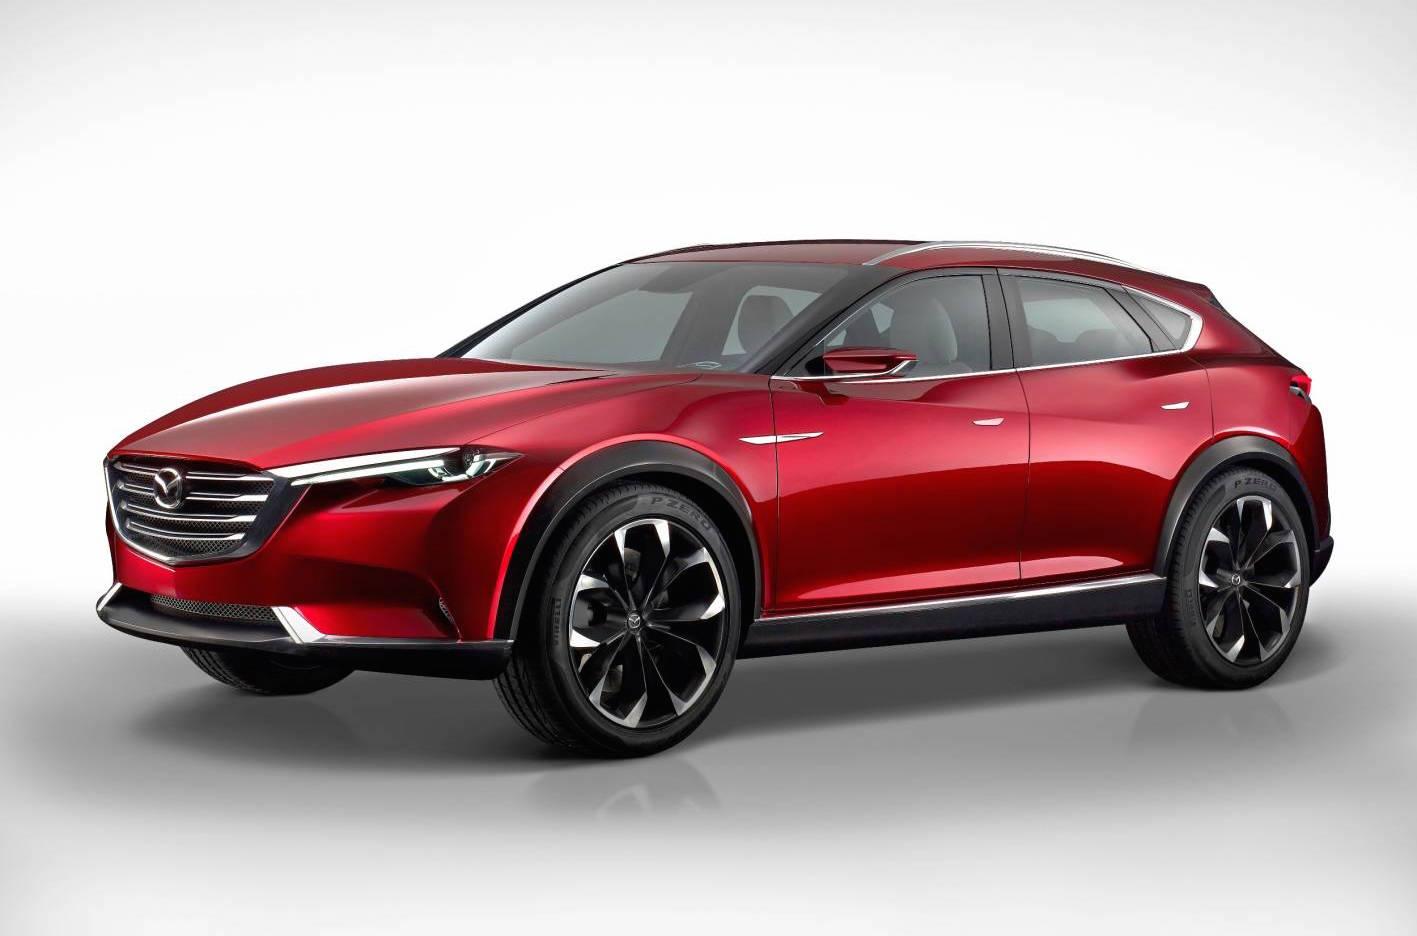 Mazda KOERU concept shows future CX-5, CX-9 design | PerformanceDrive